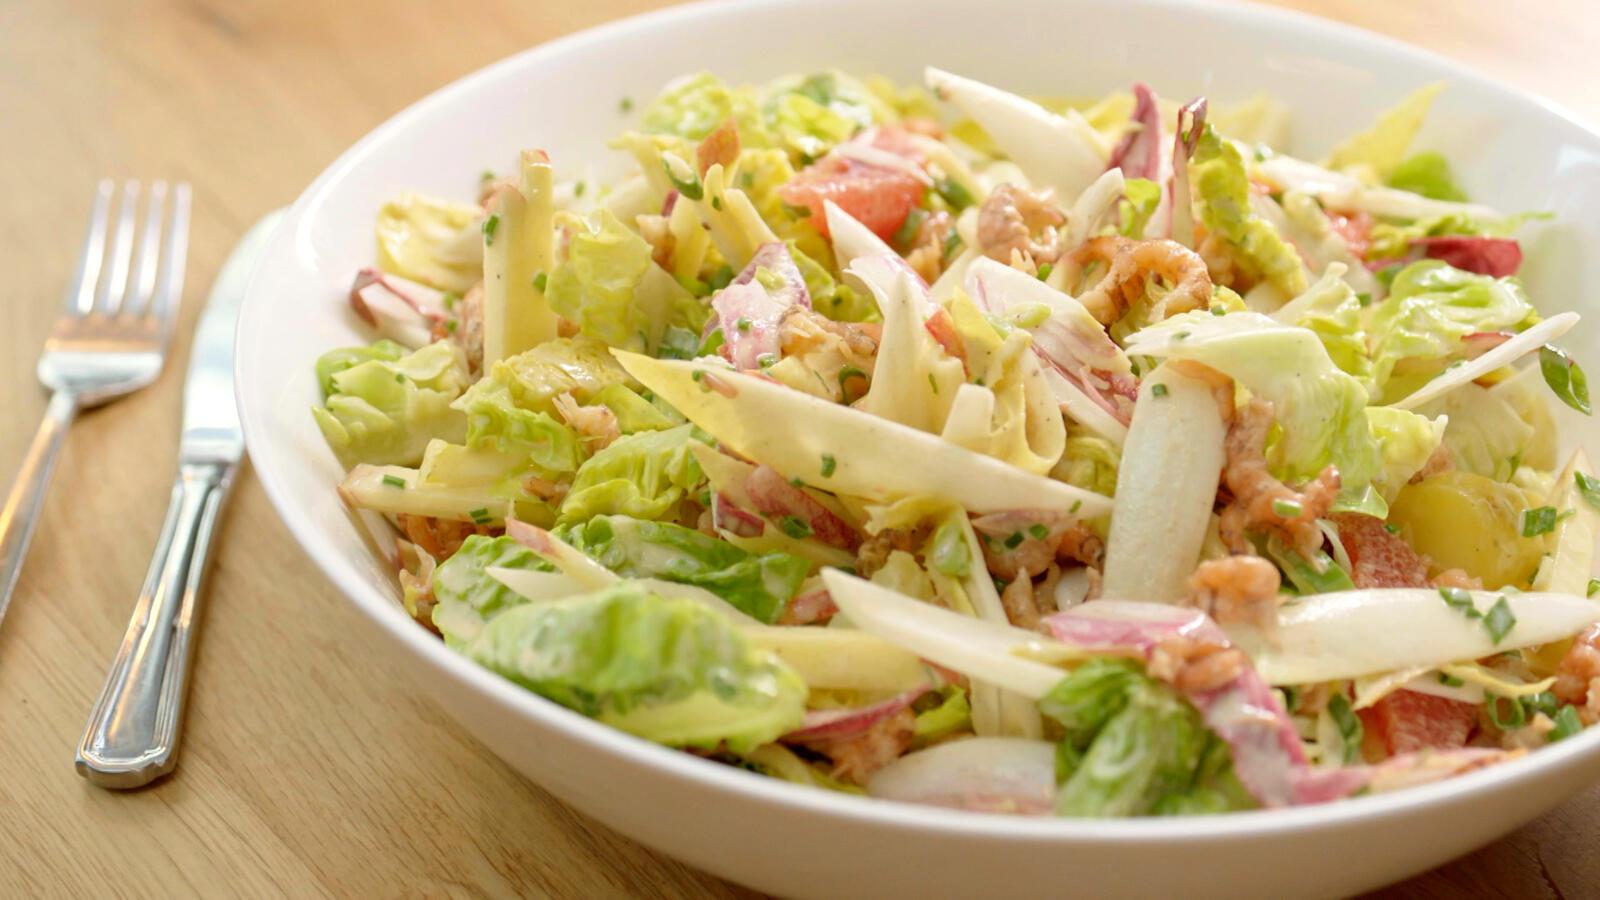 Witloofsalade met garnalen, pompelmoes en vinaigrette salée